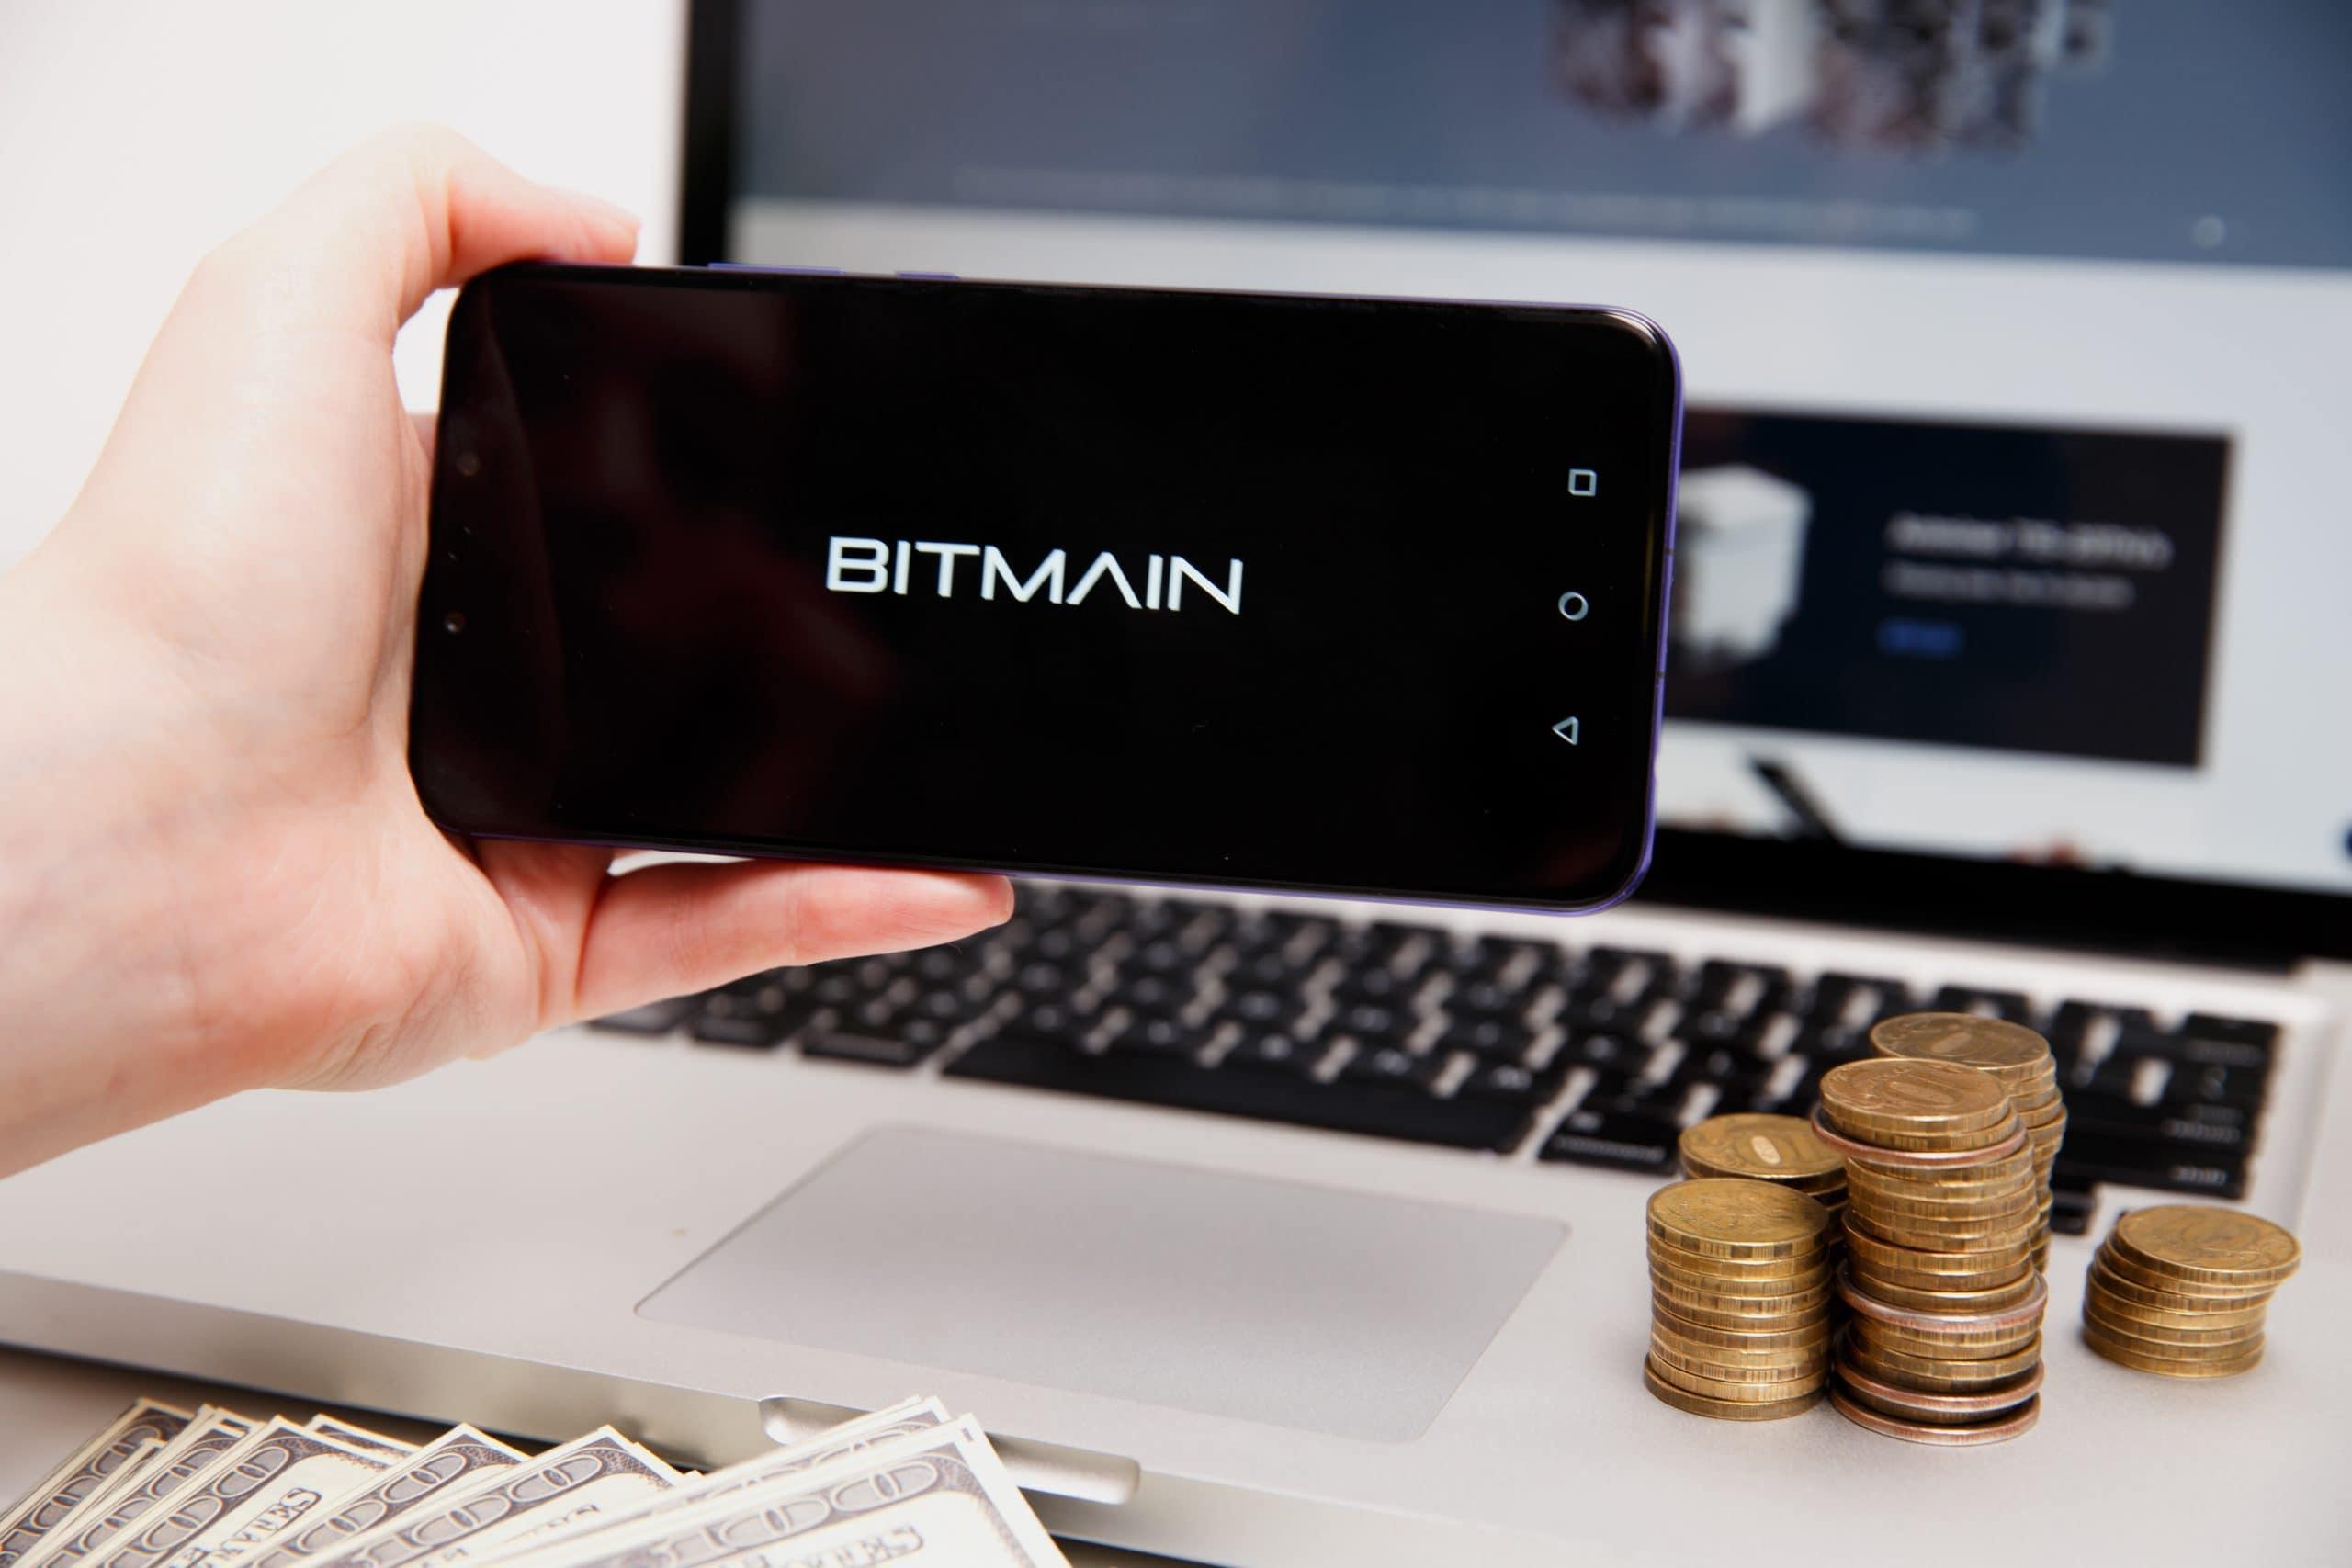 Bitmain logo on phone